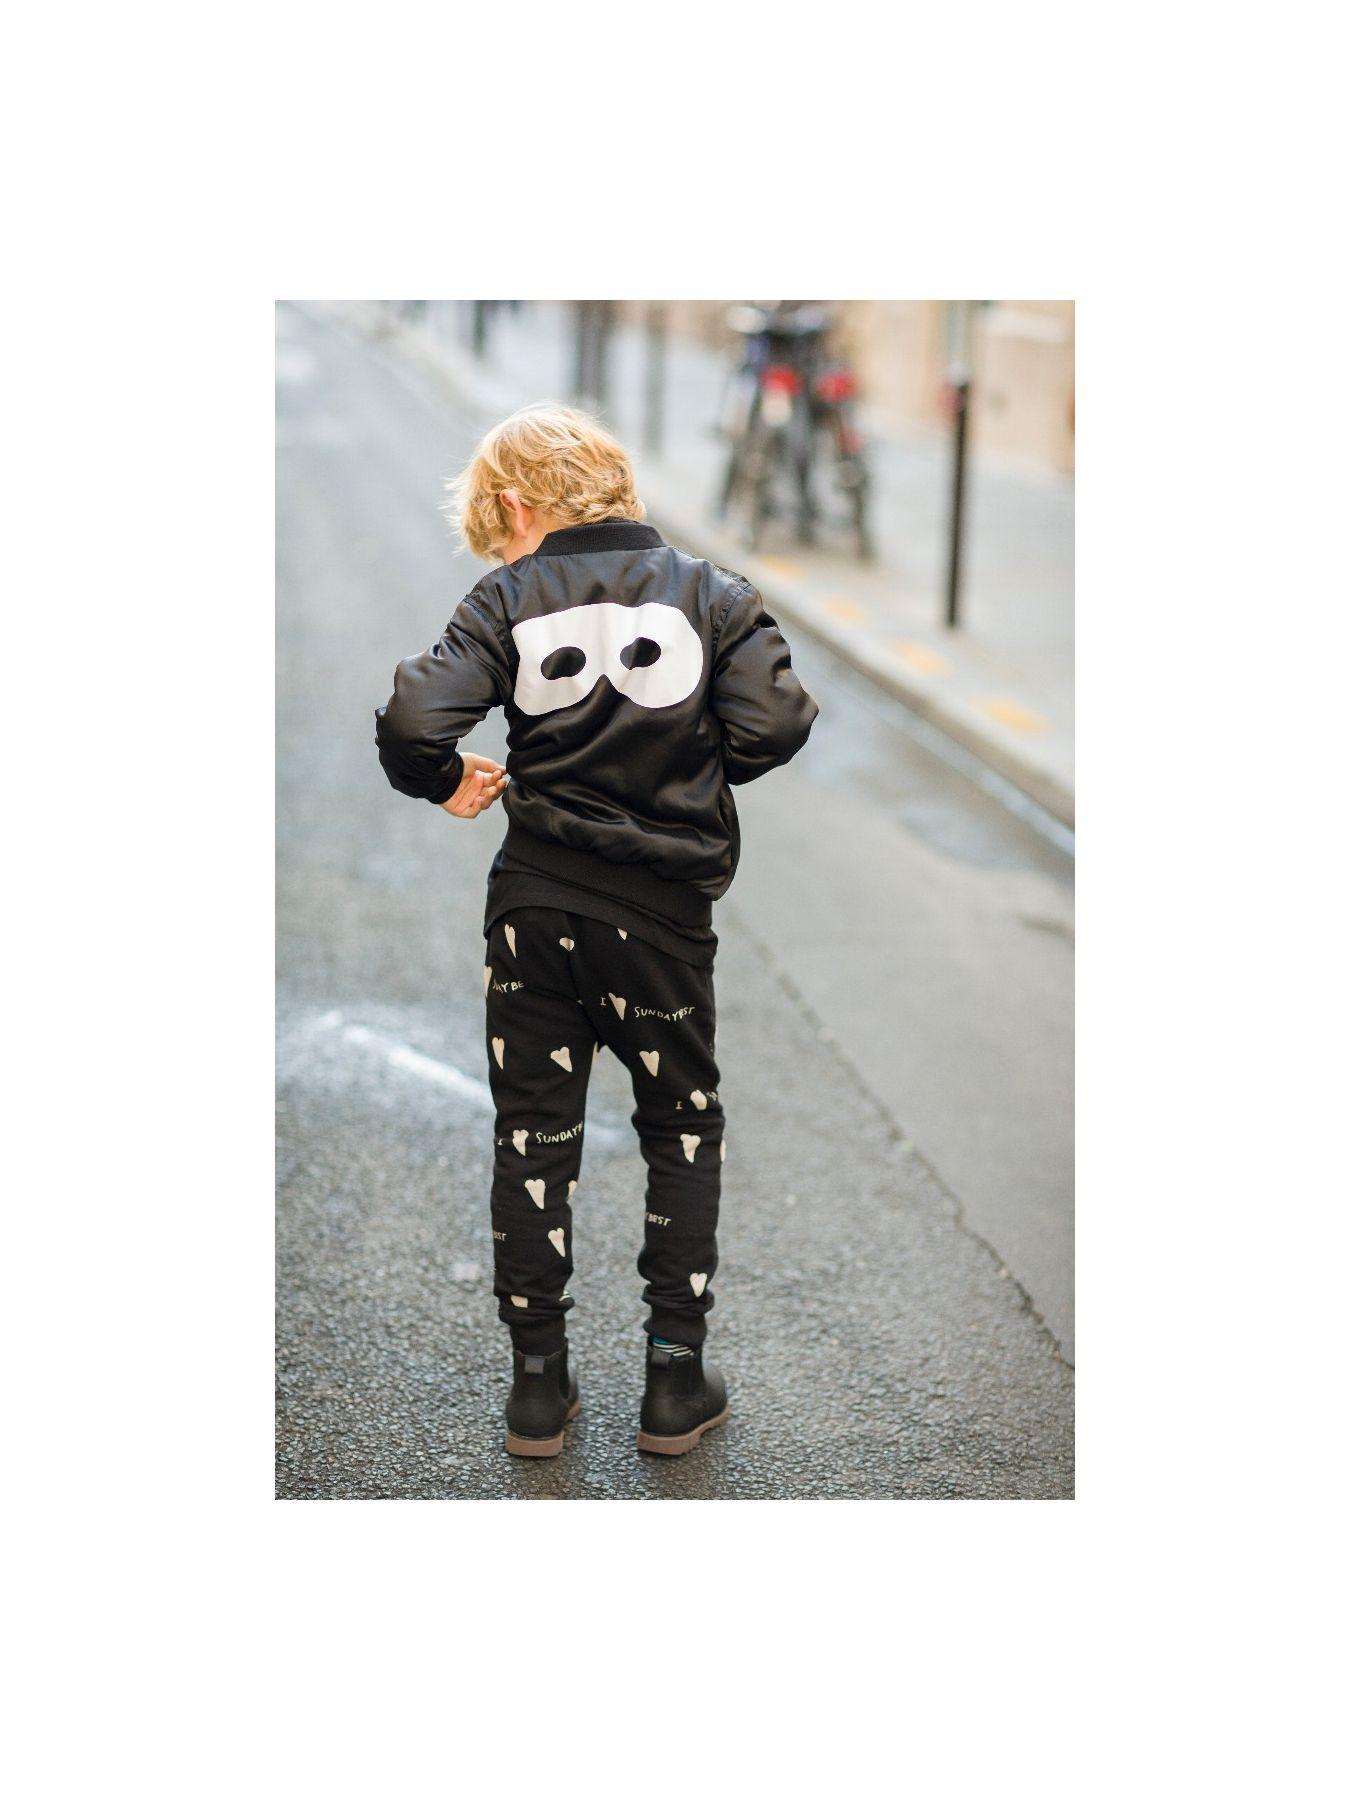 96011b421 Beau Loves black bomber jacket : Trendbee